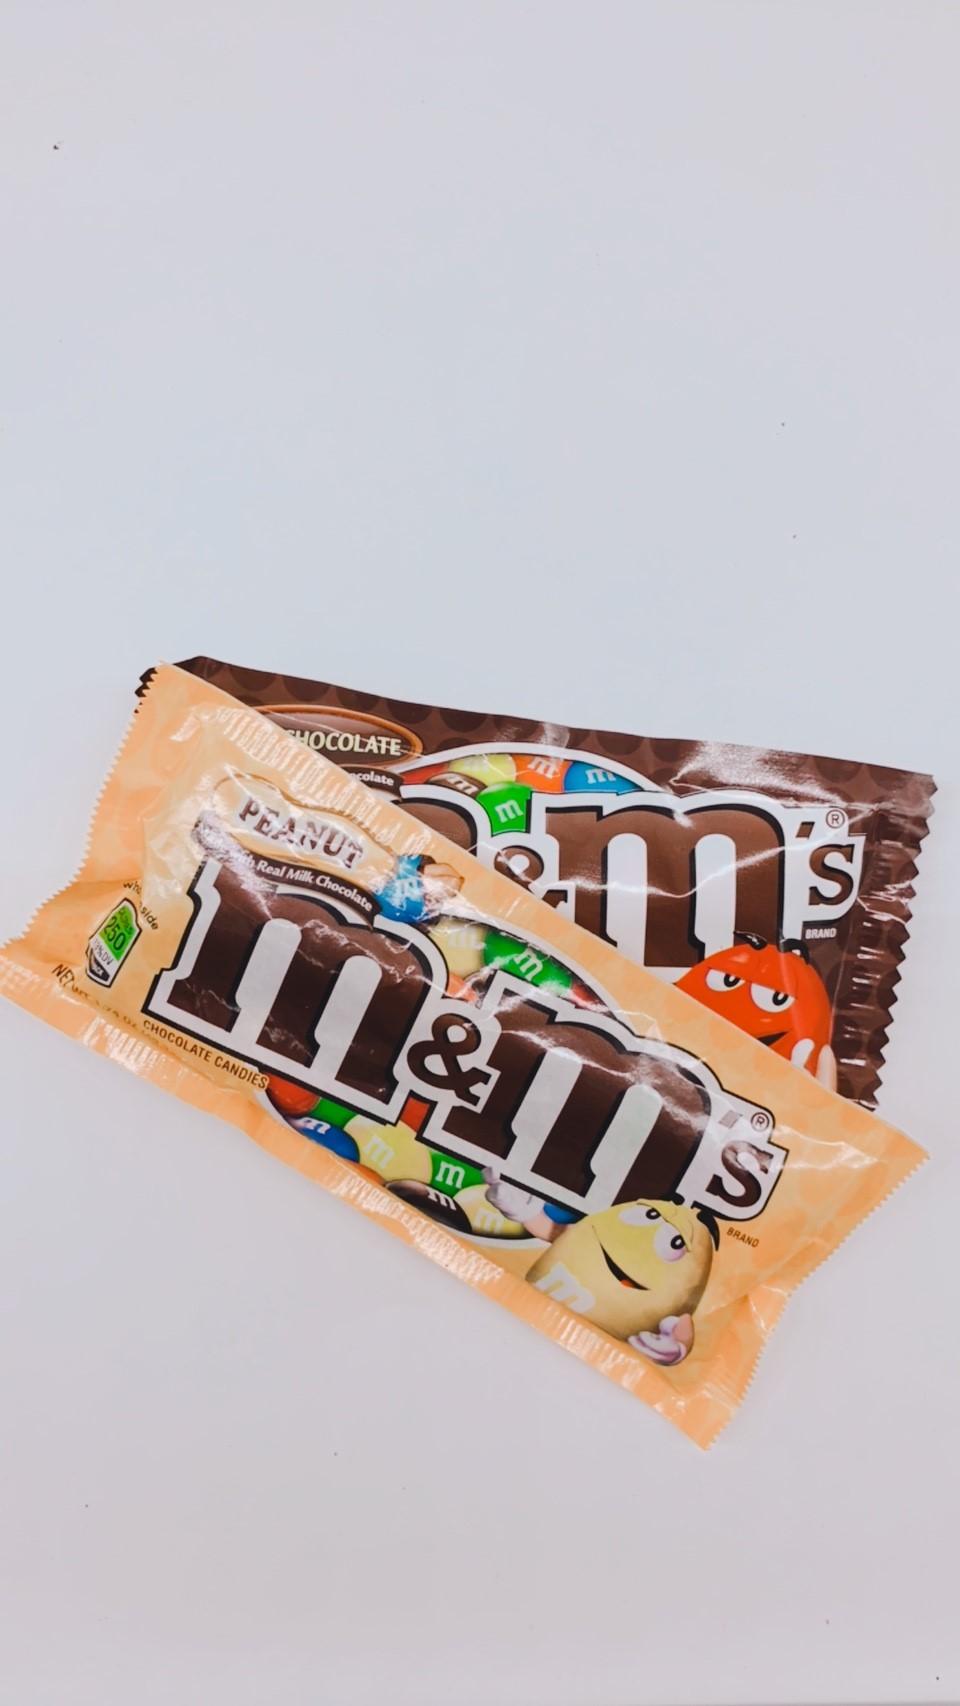 MM 巧克力 零食 花生巧克力 糖果 融化巧克力 經典零食